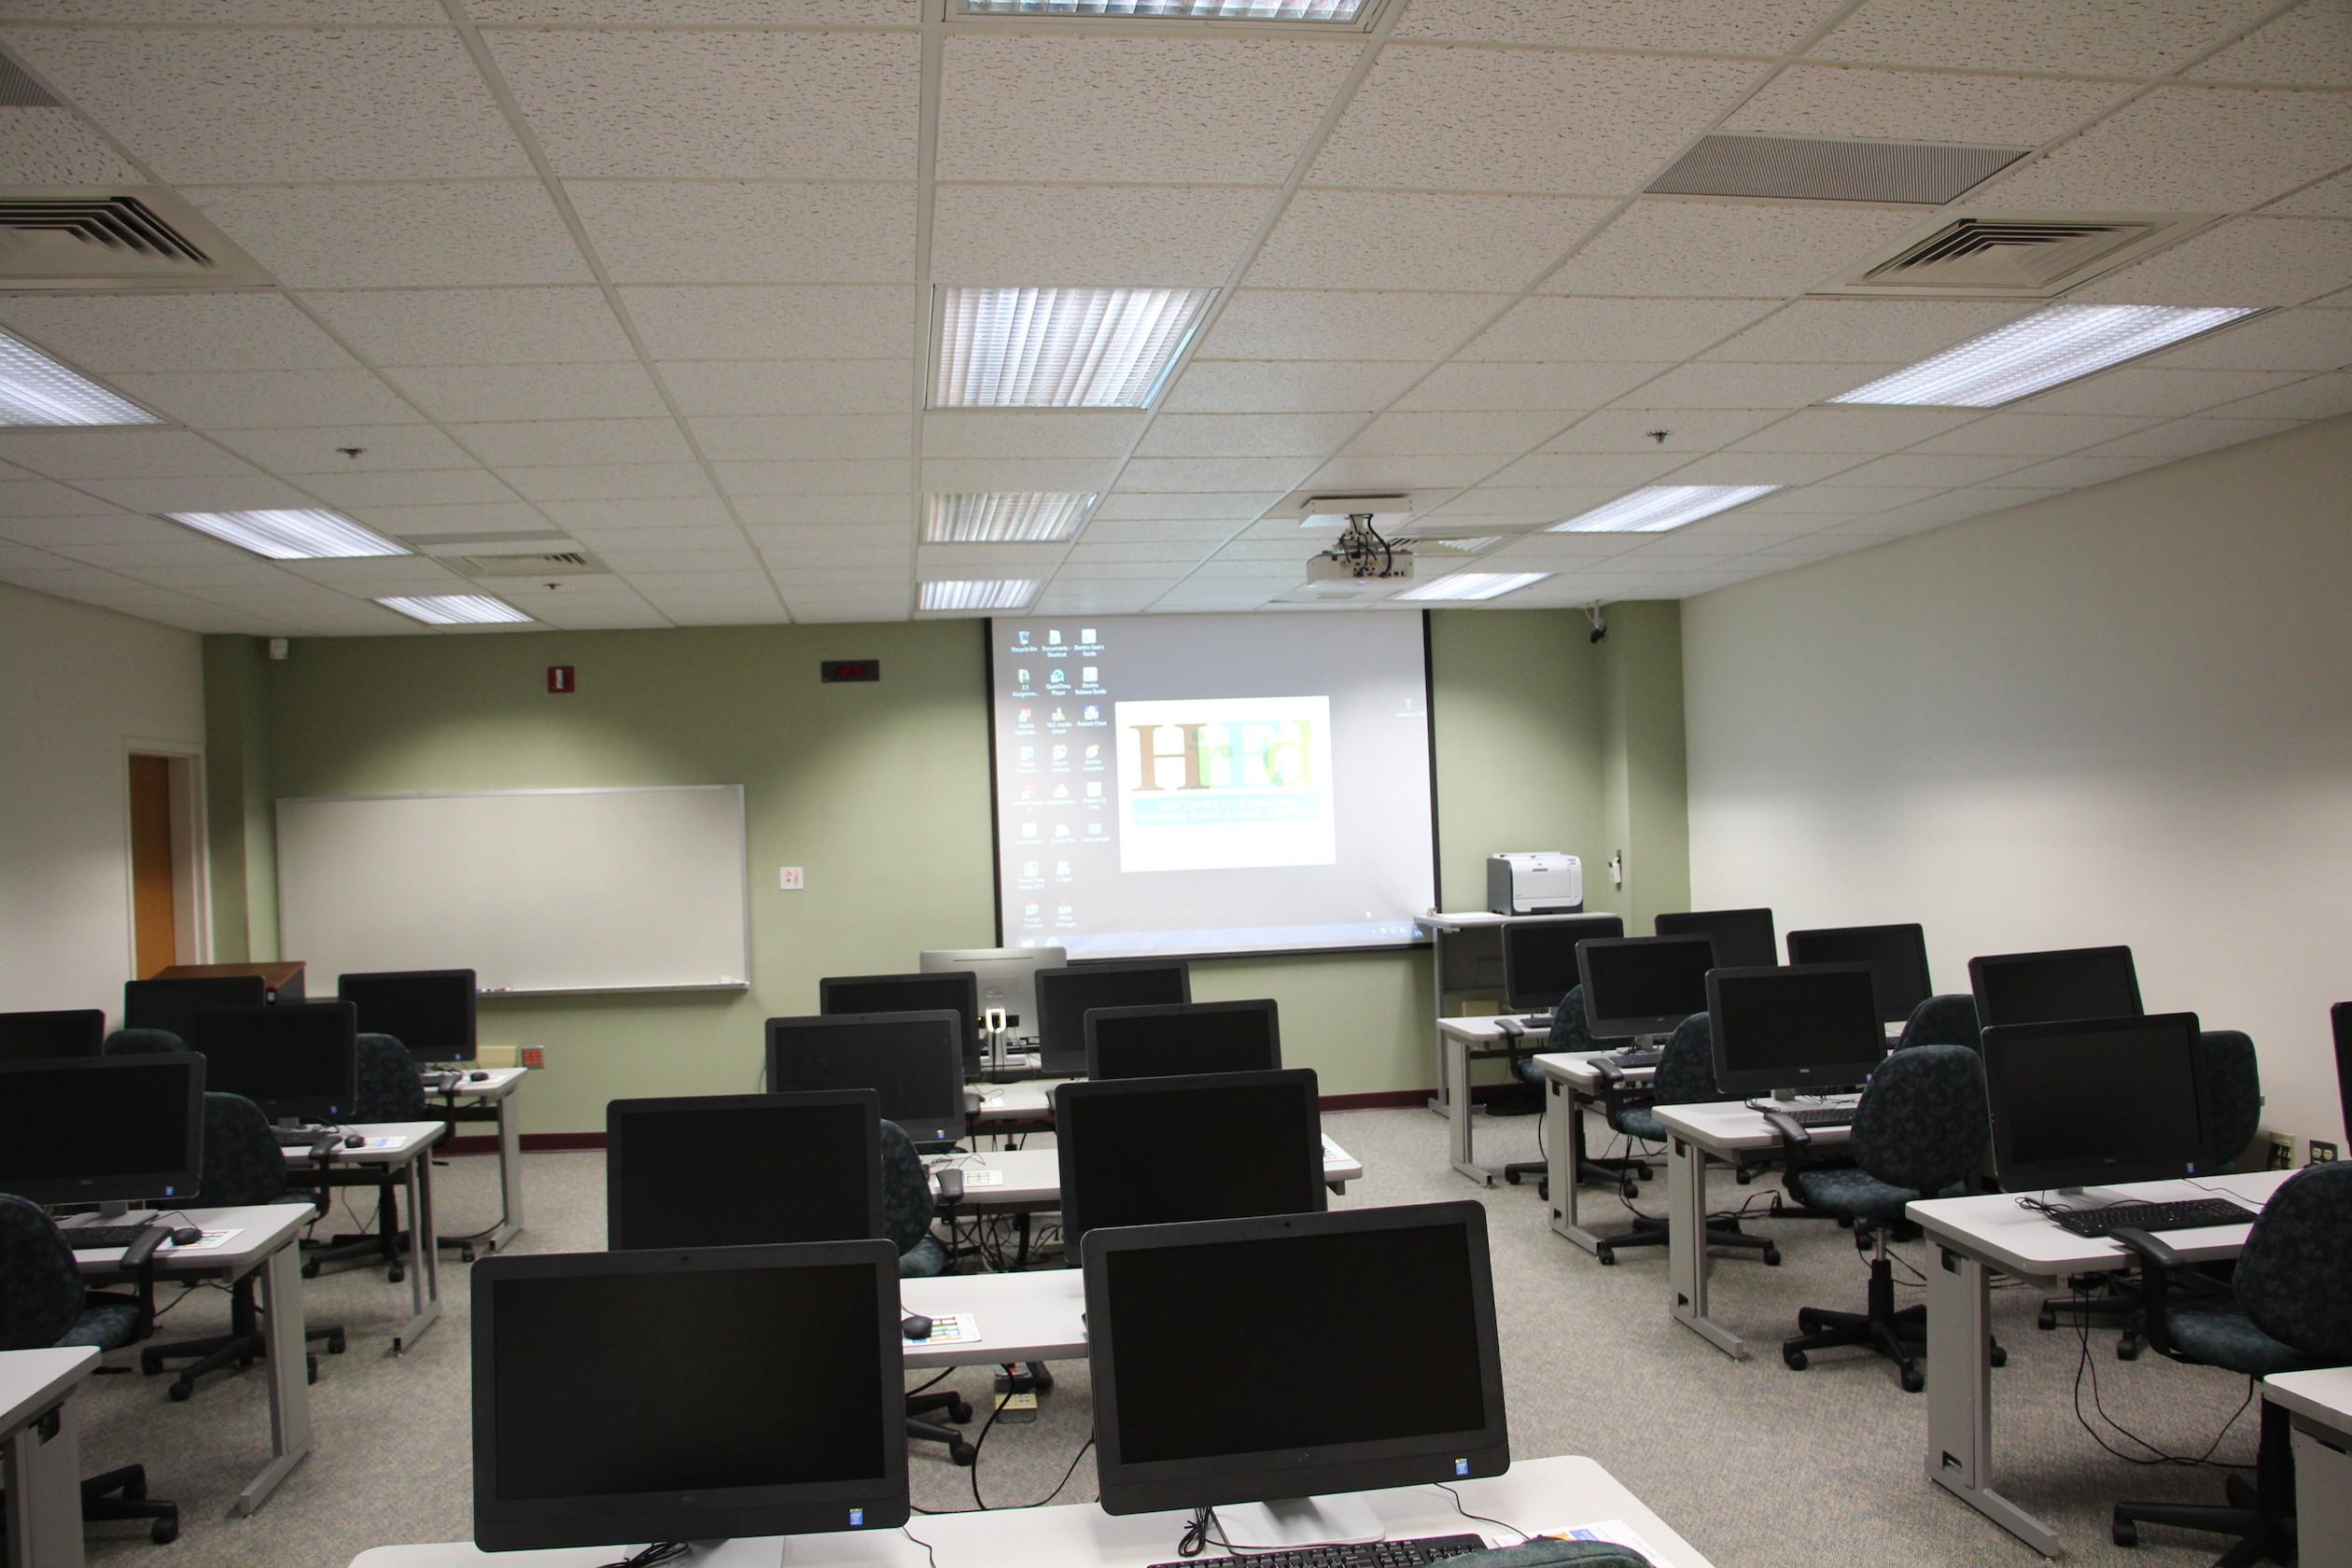 Southwest Virginia Higher Education Center